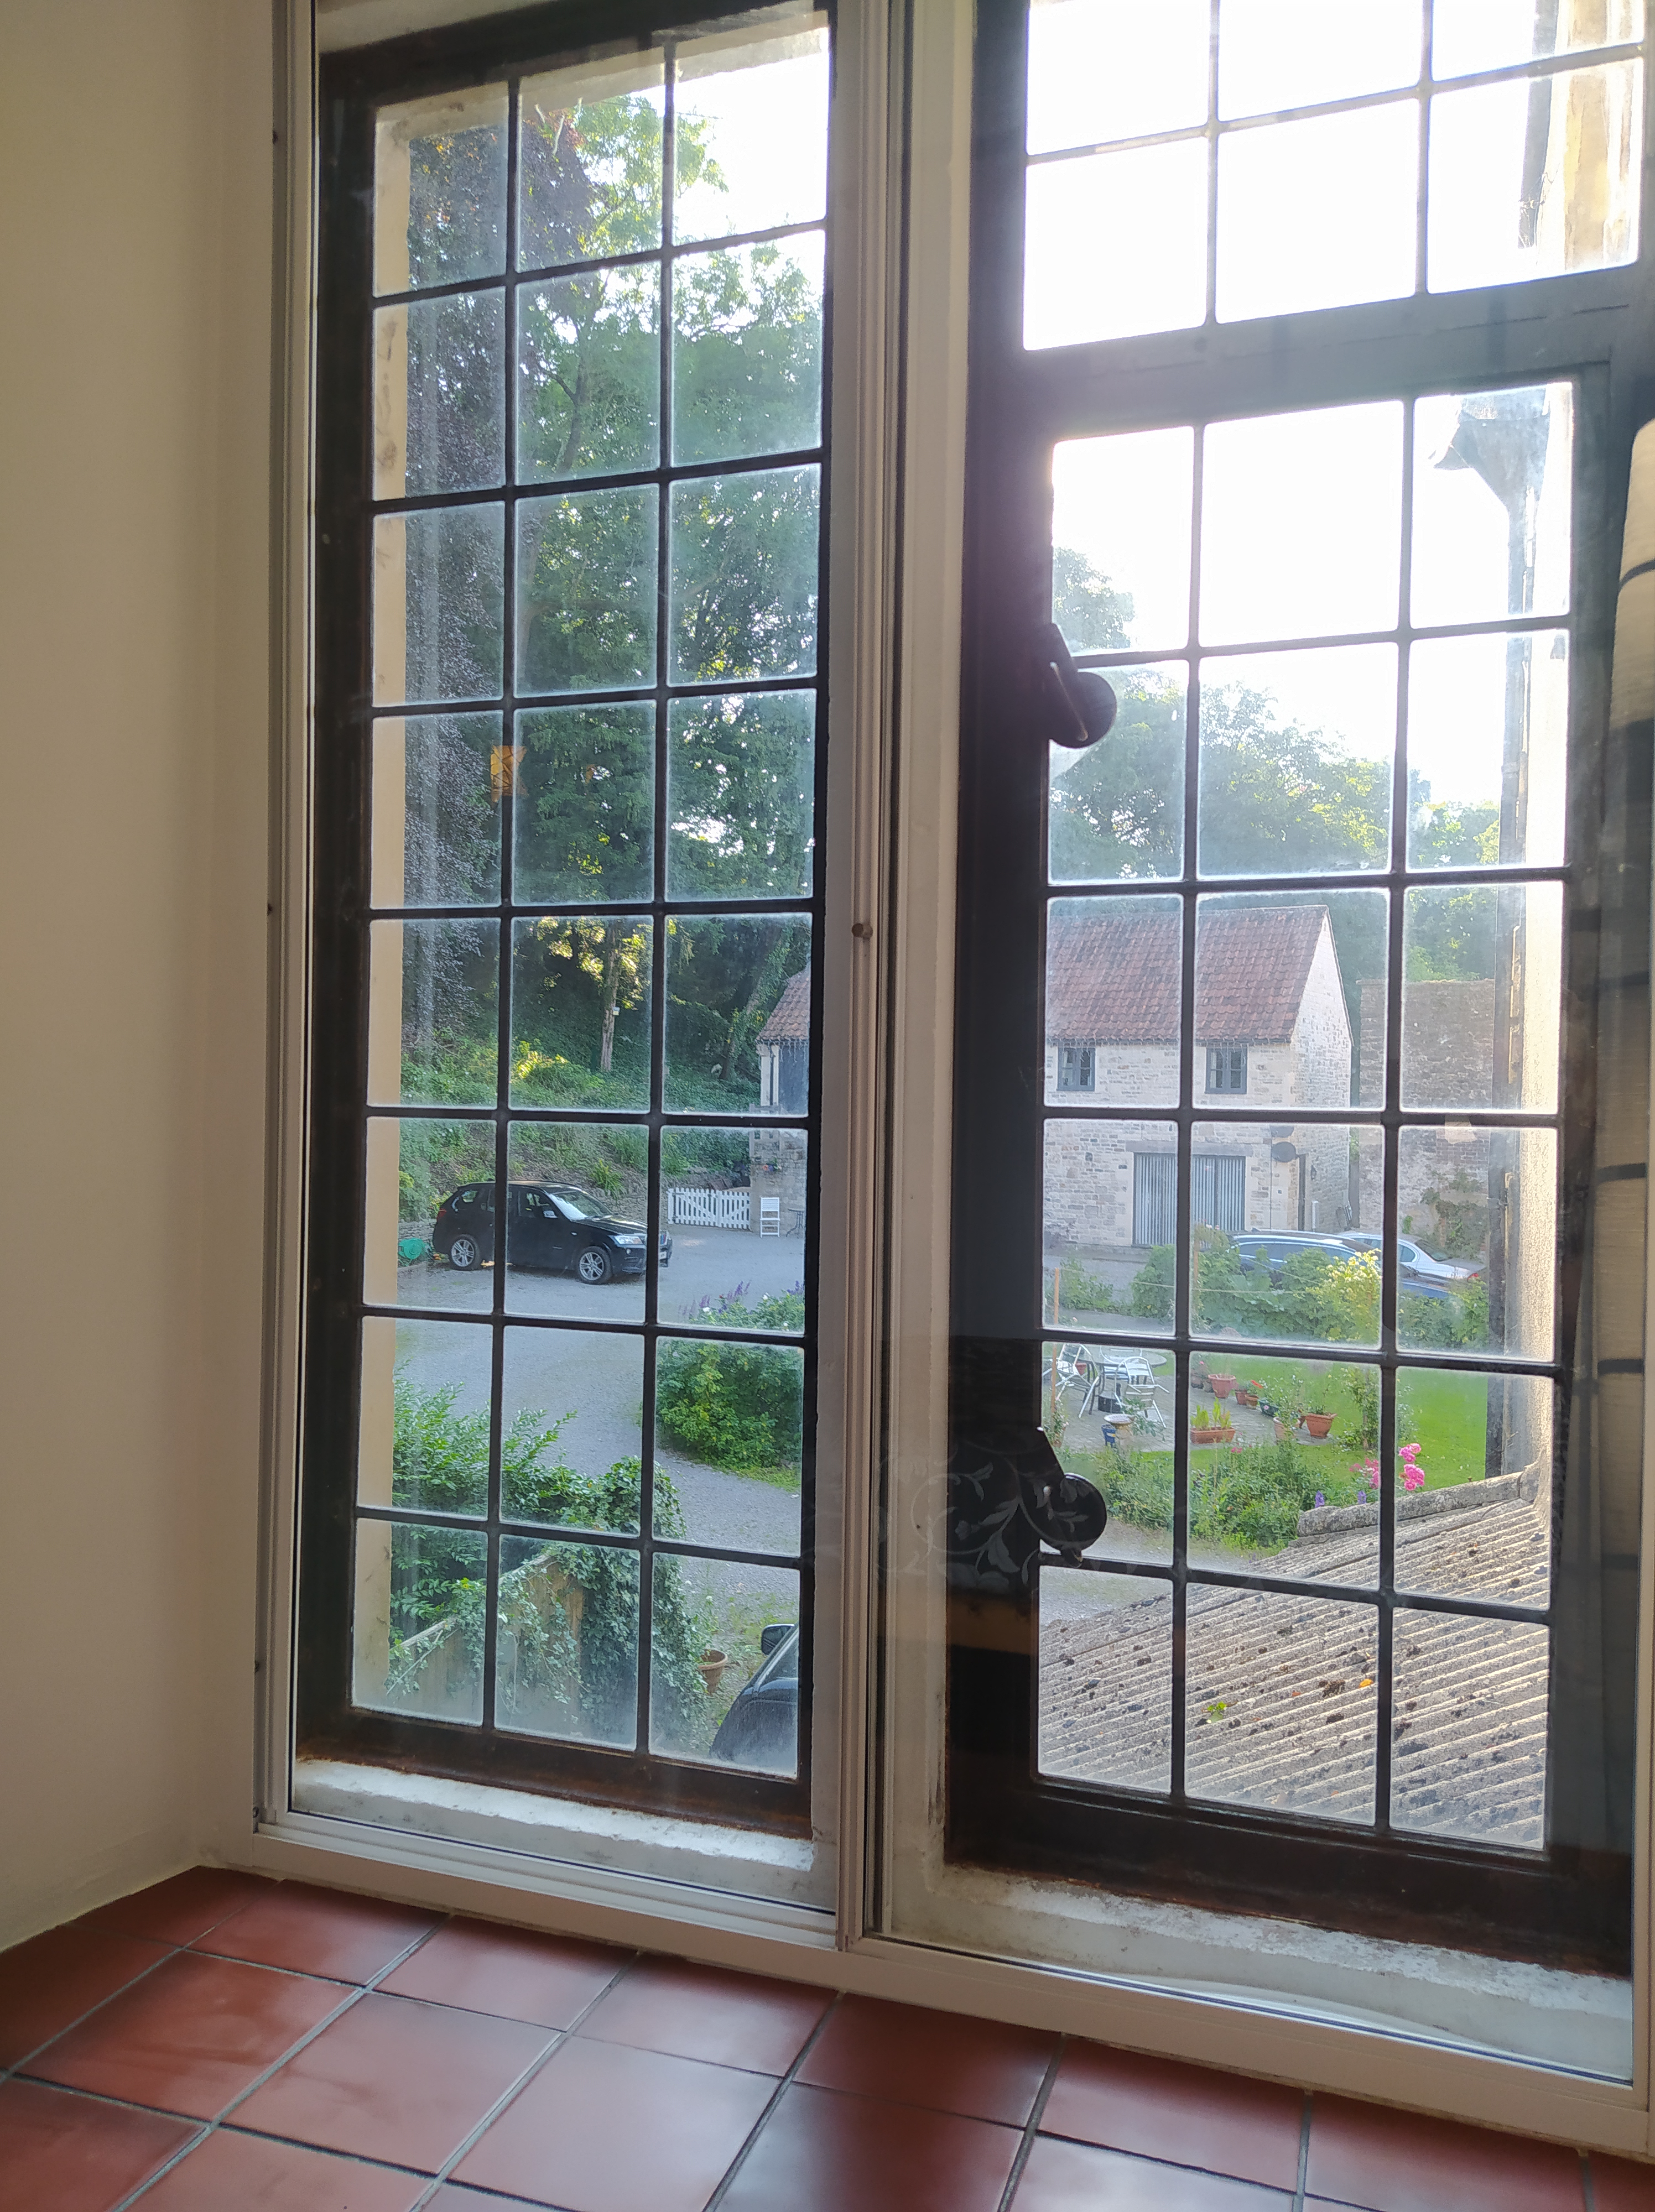 Old Masonic Lodge view